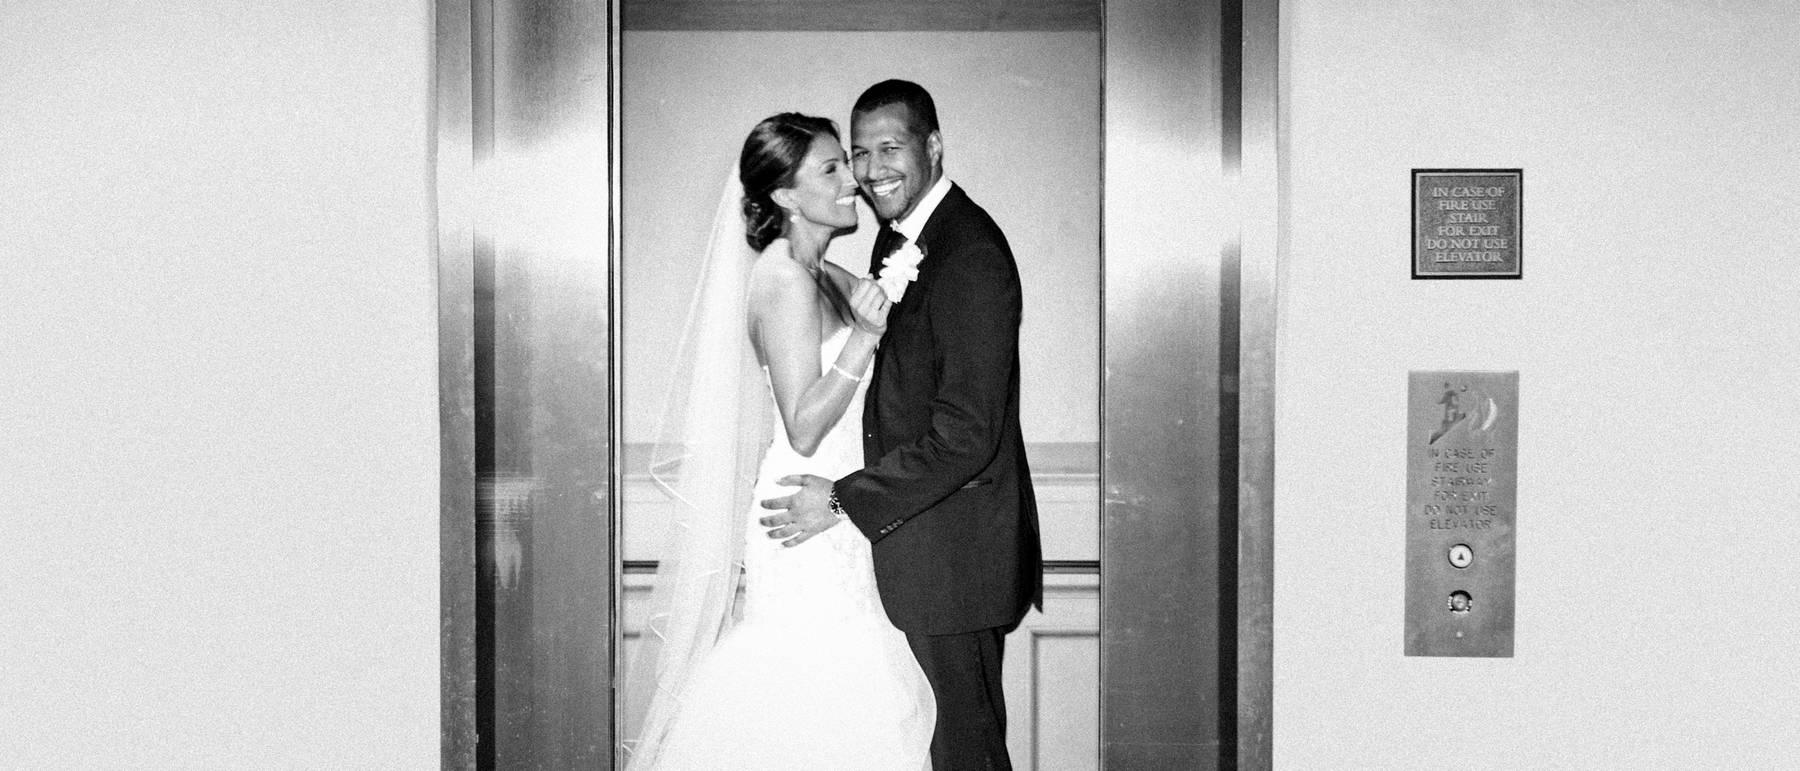 johnandjoseph-wedding-photographer-hz-slider-215